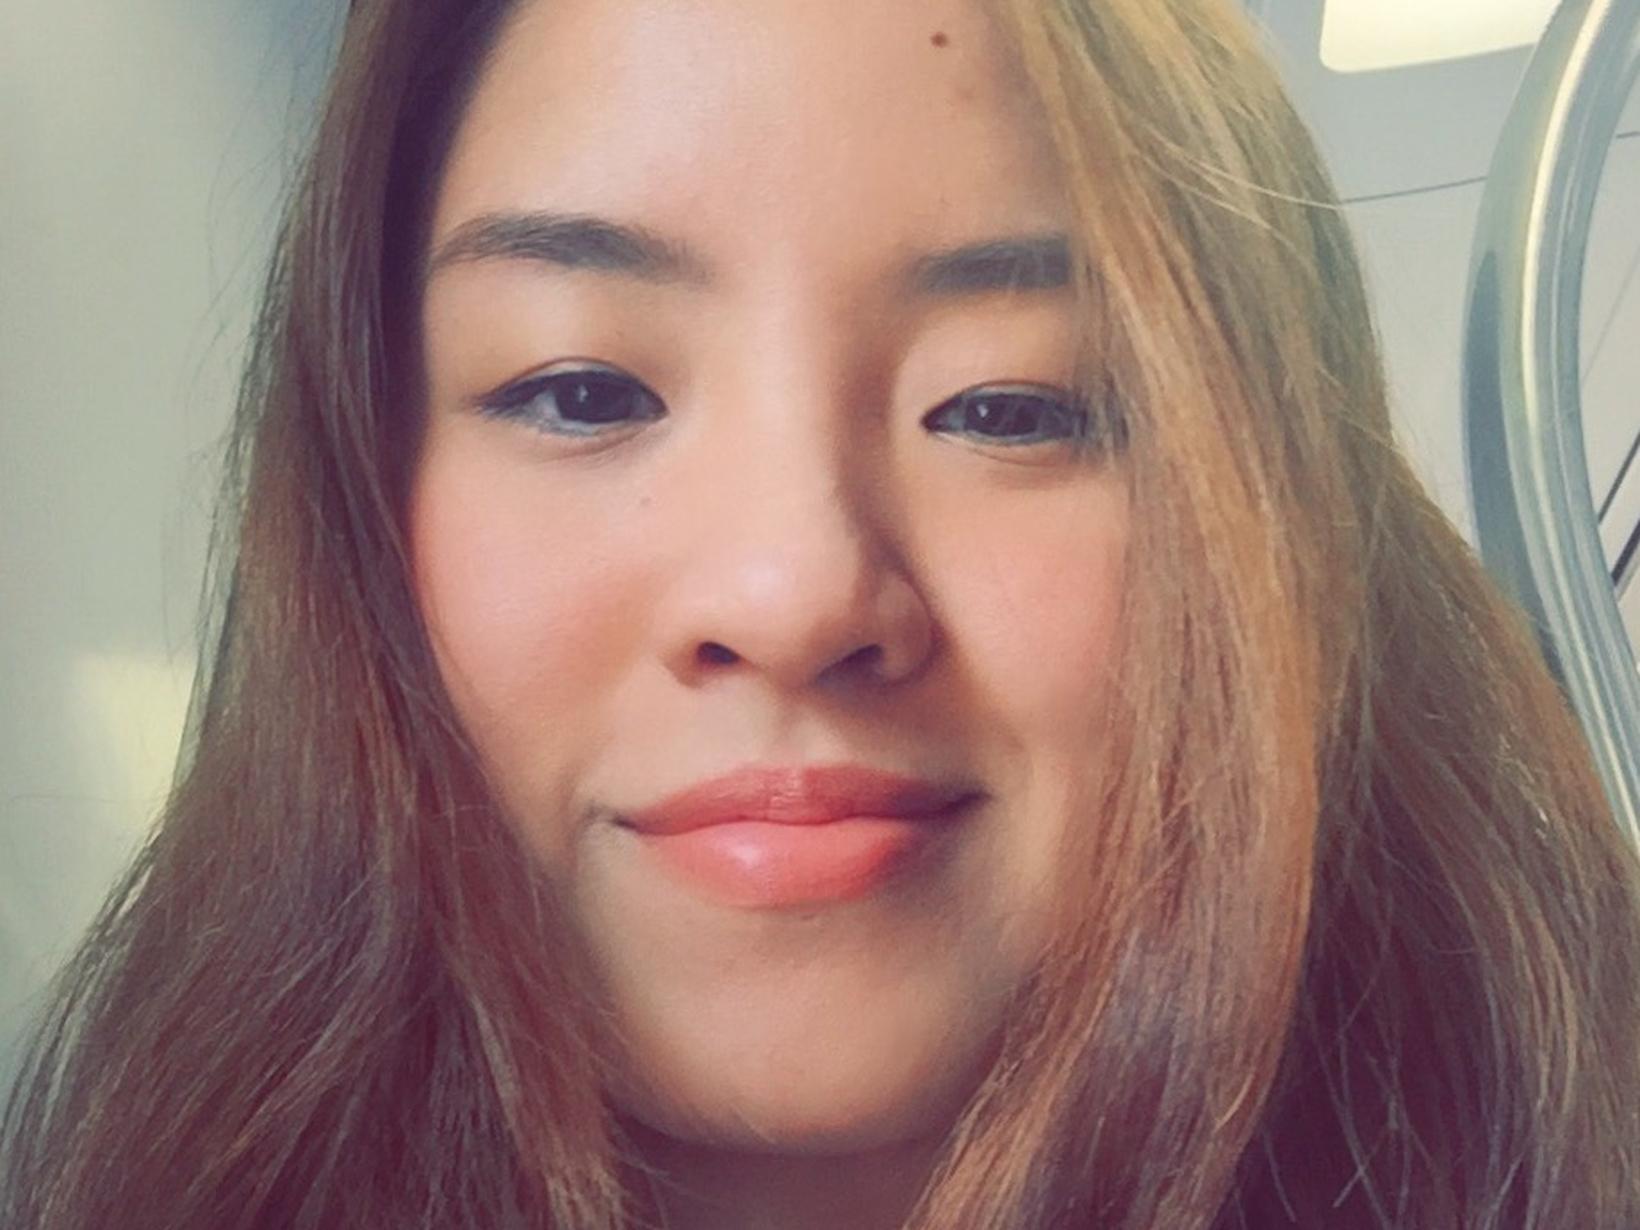 Vanessa from Singapore, Singapore